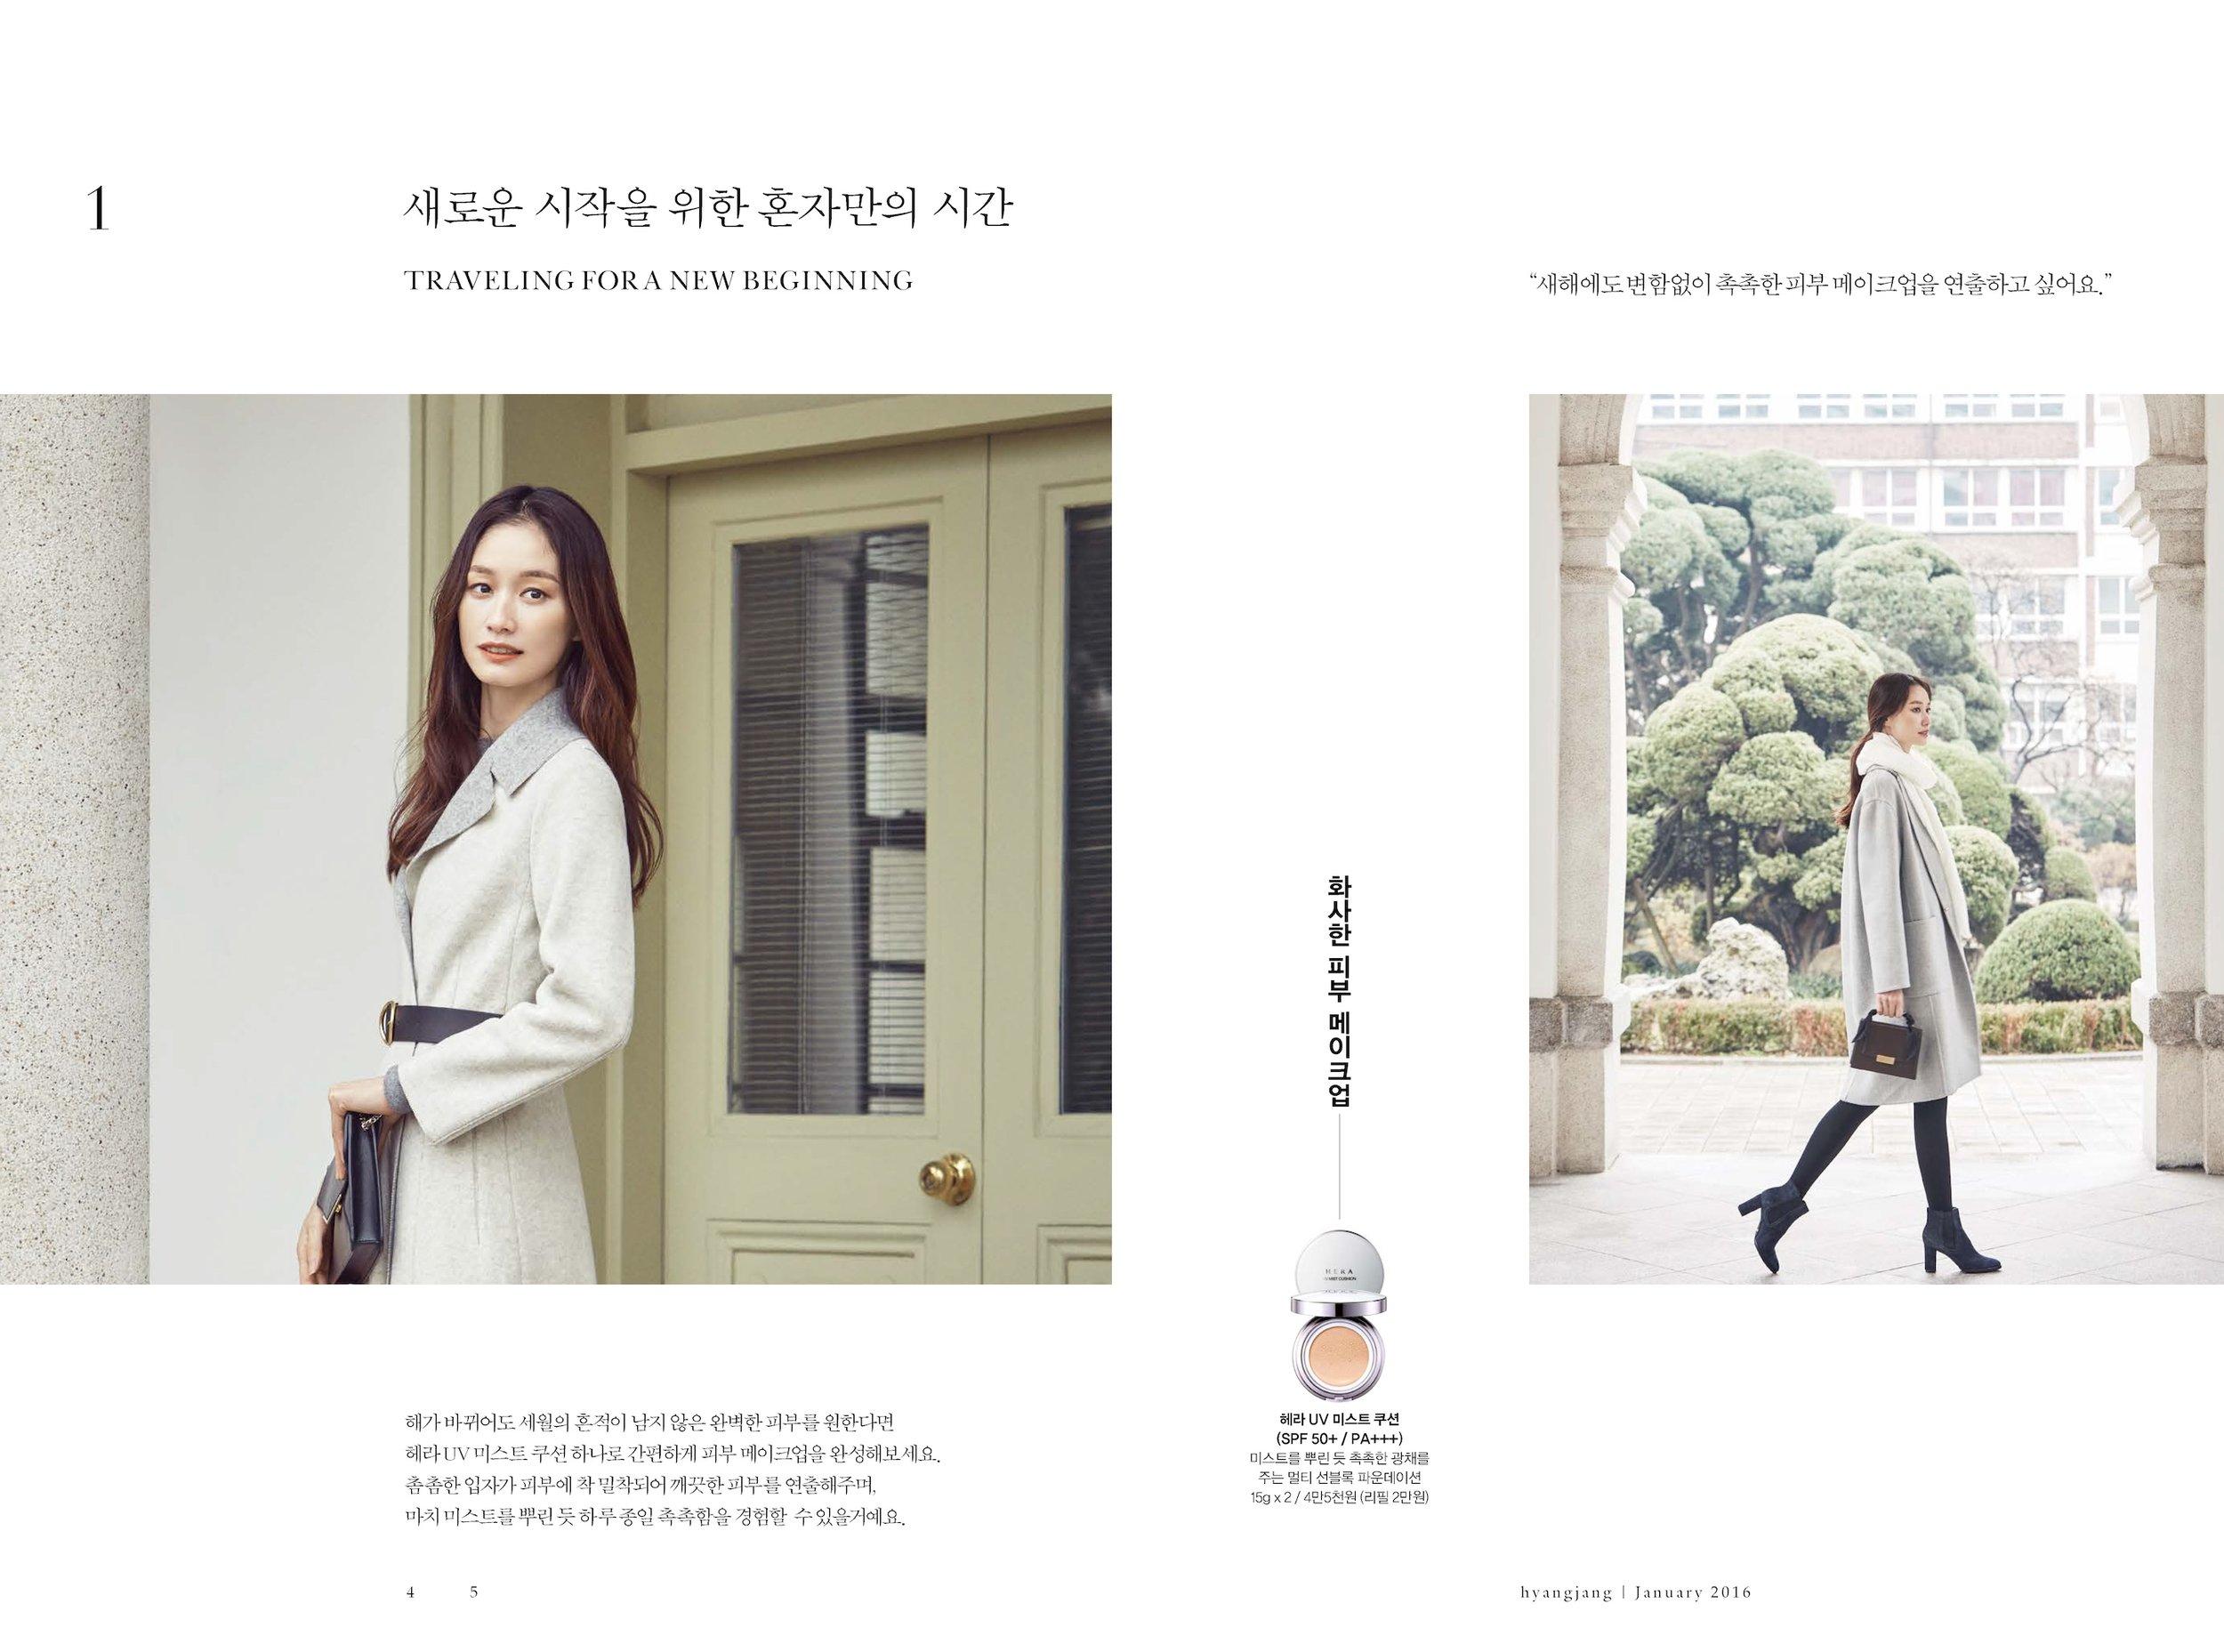 hyangjang-201601_페이지_02.jpeg